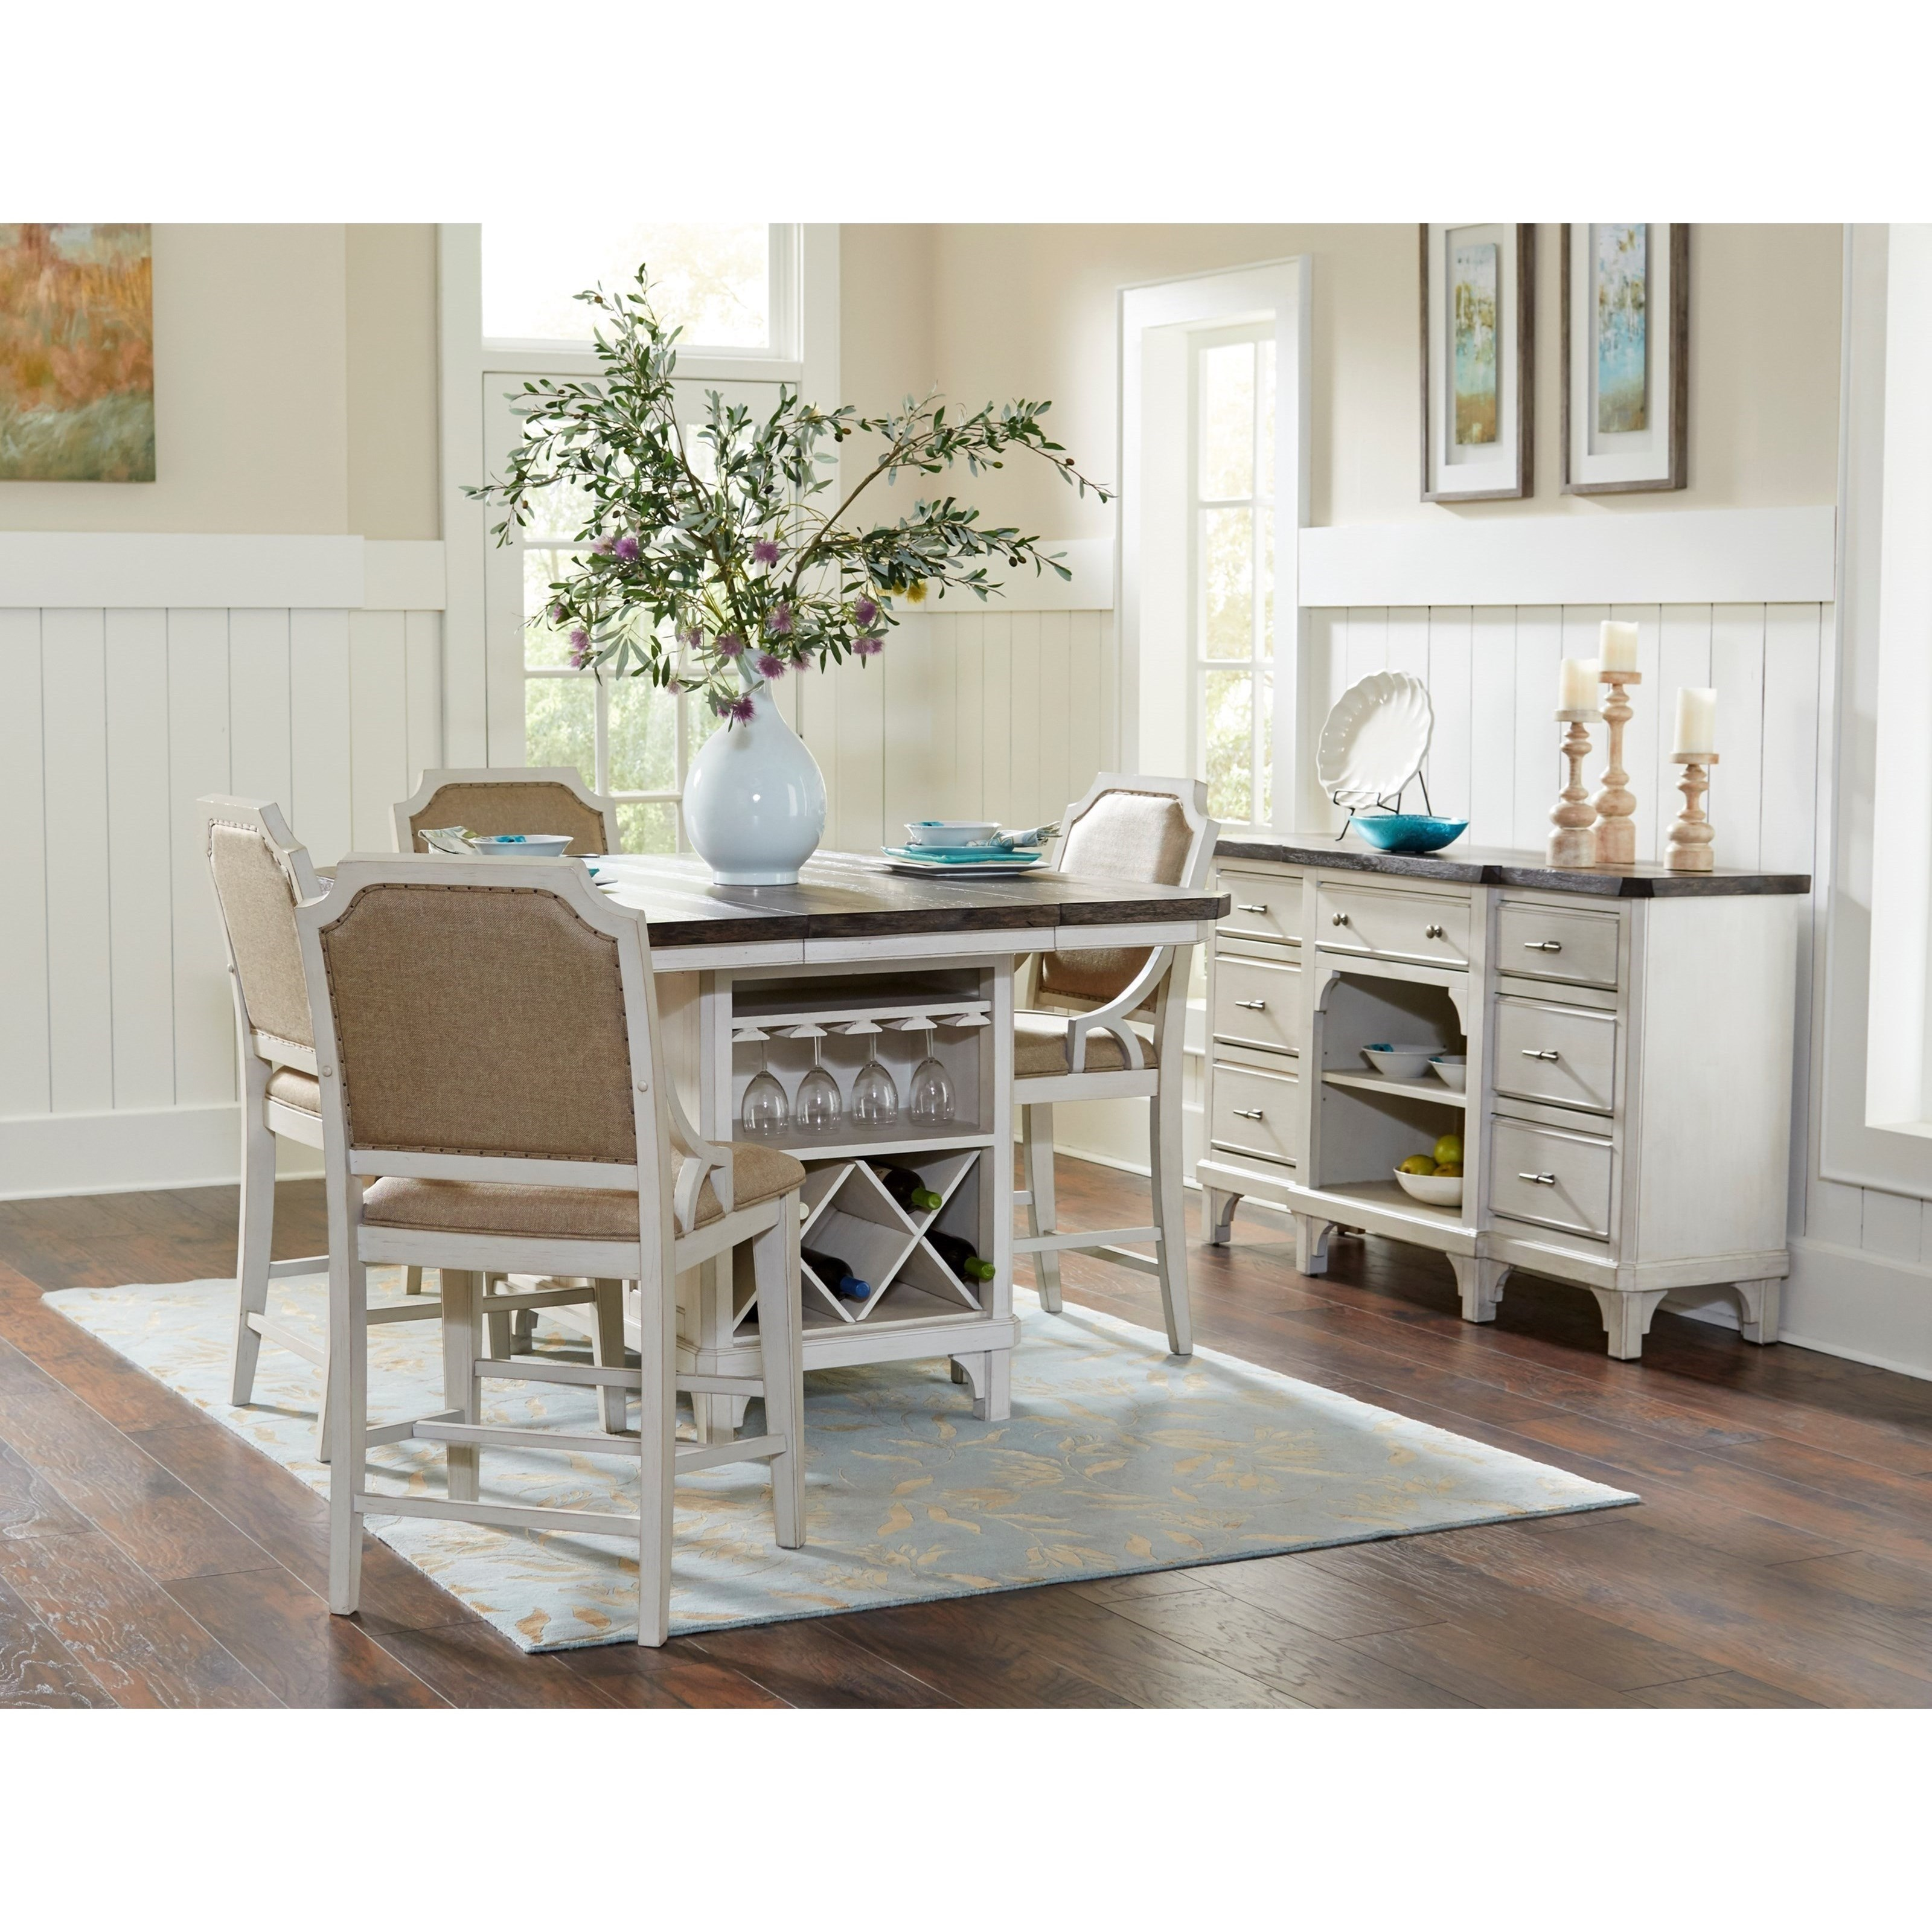 Kitchen Island Furniture Piece: Avalon Furniture Mystic Cay 5-Piece Kitchen Island Table